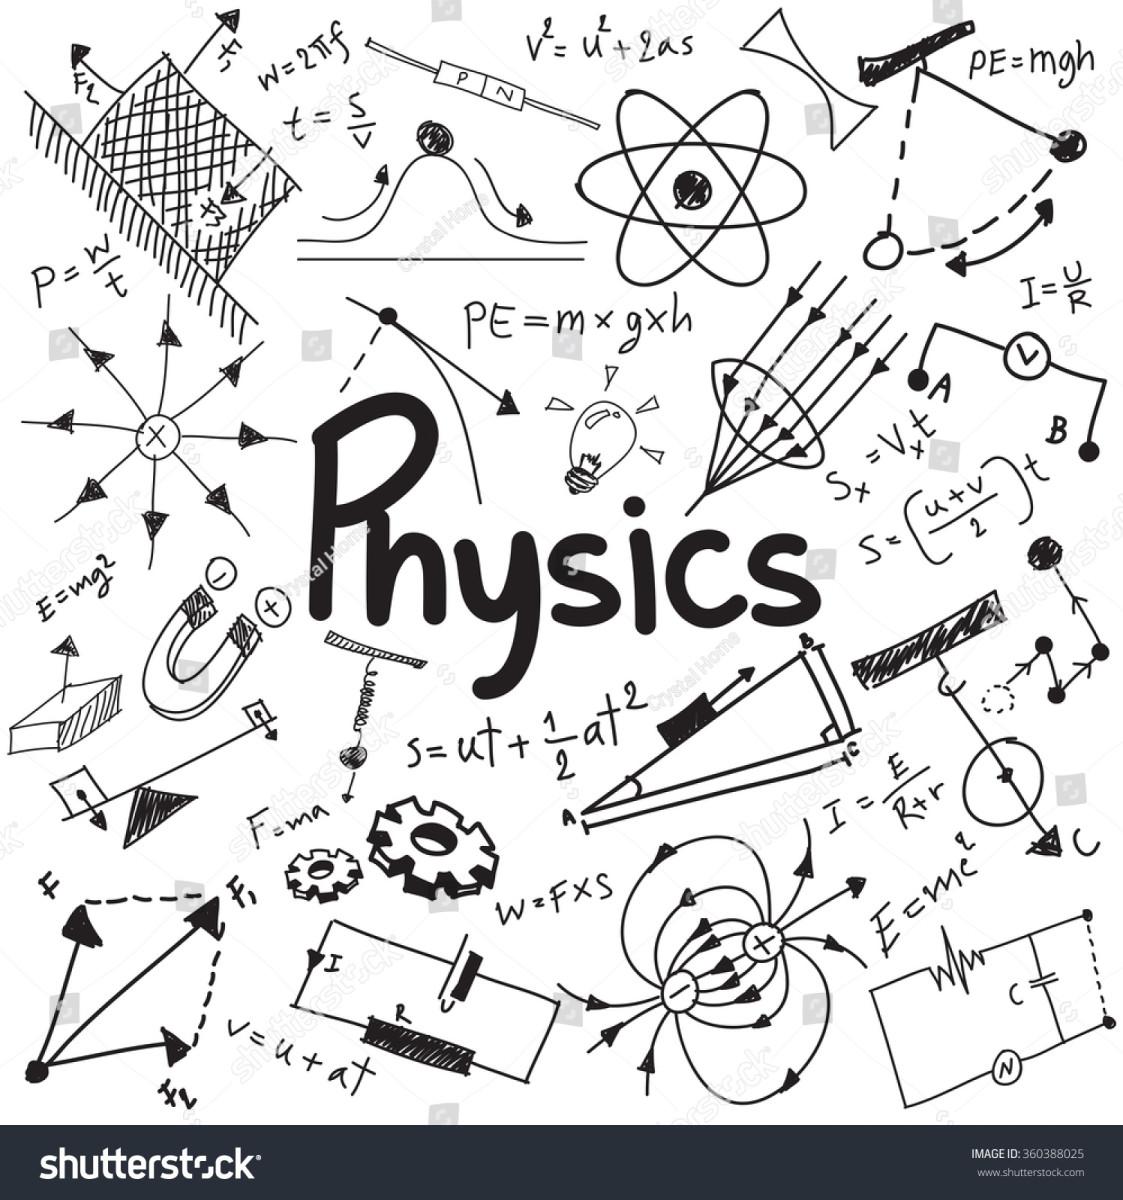 Basic Physics Lesson-12 : Rotational Motion